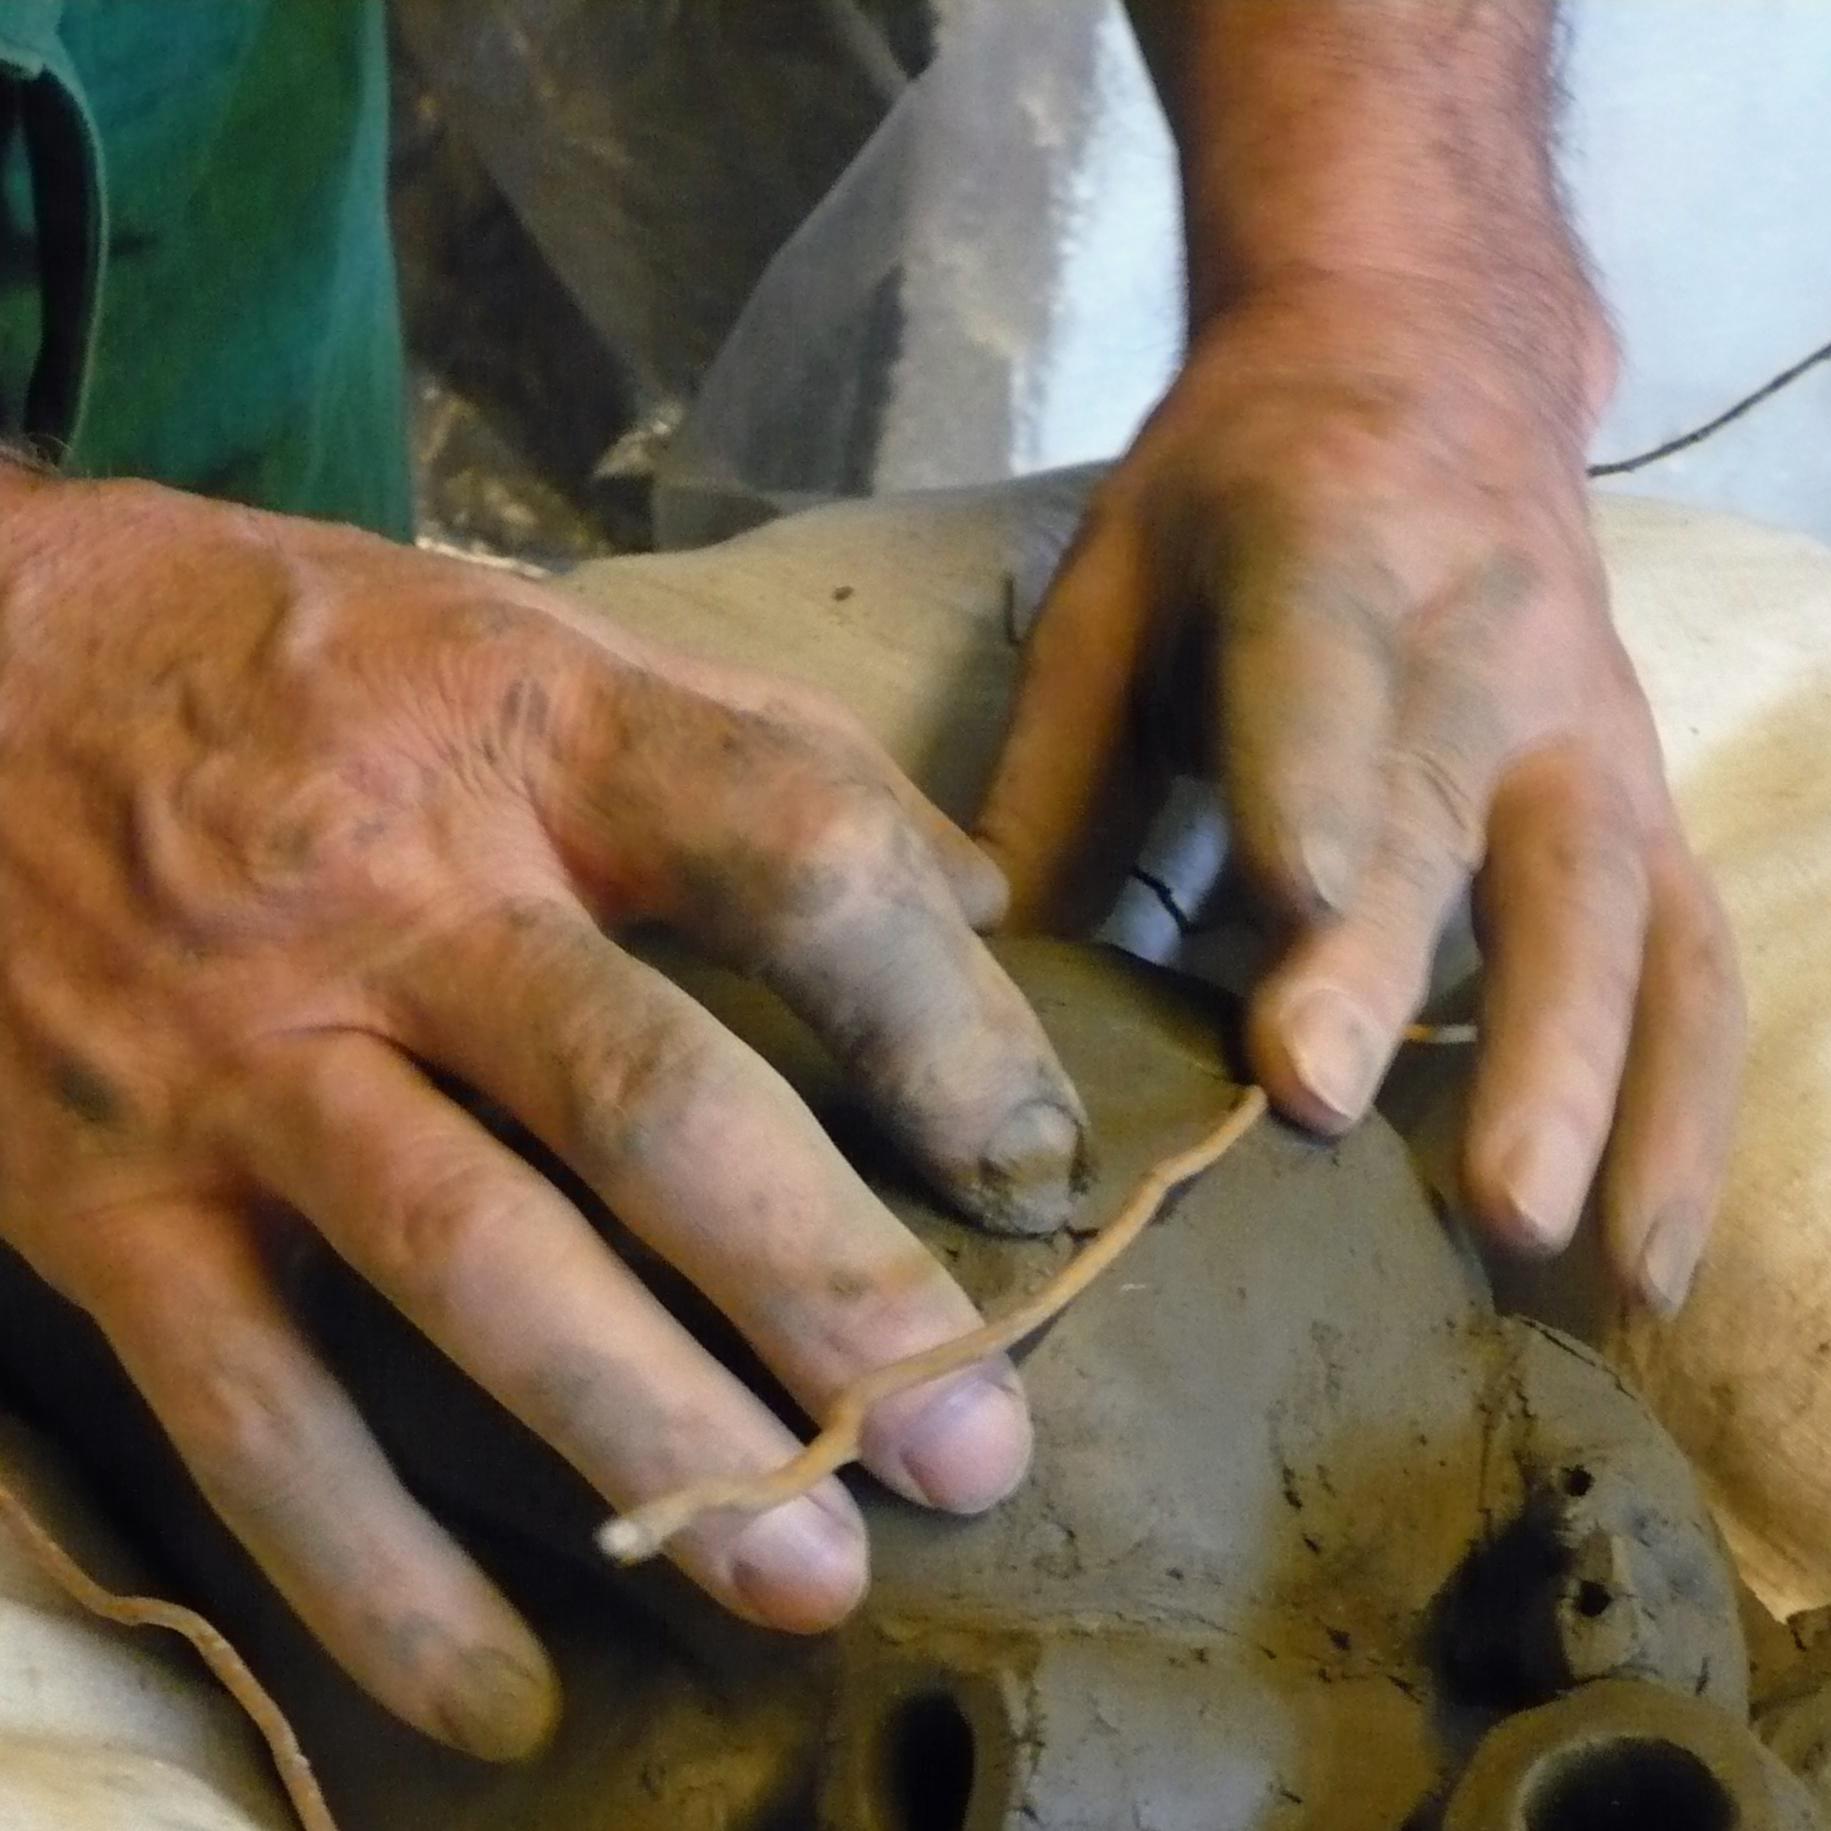 Atelier creatif - Atelier Modelage - Gissinger Mariele – Sculpture – Bronzes – Modelage – Terre – Ton - Céramique – Porcelaine – Porcelain – Artiste - Art-gm – Alsace - France